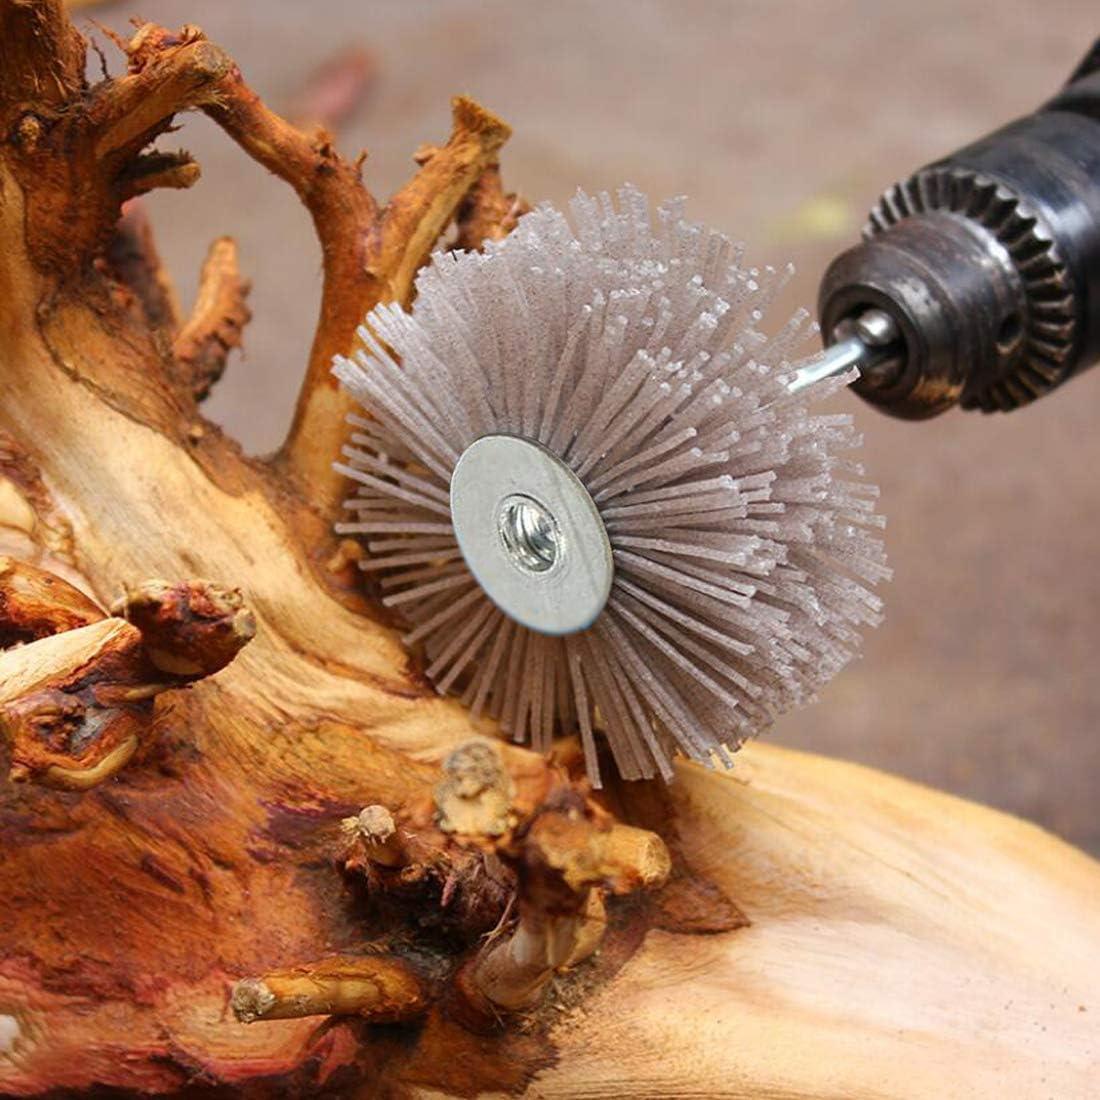 Details about  /2 PCS Abrasive Grinding Wheel Flower Head For Wood Furniture Polishing